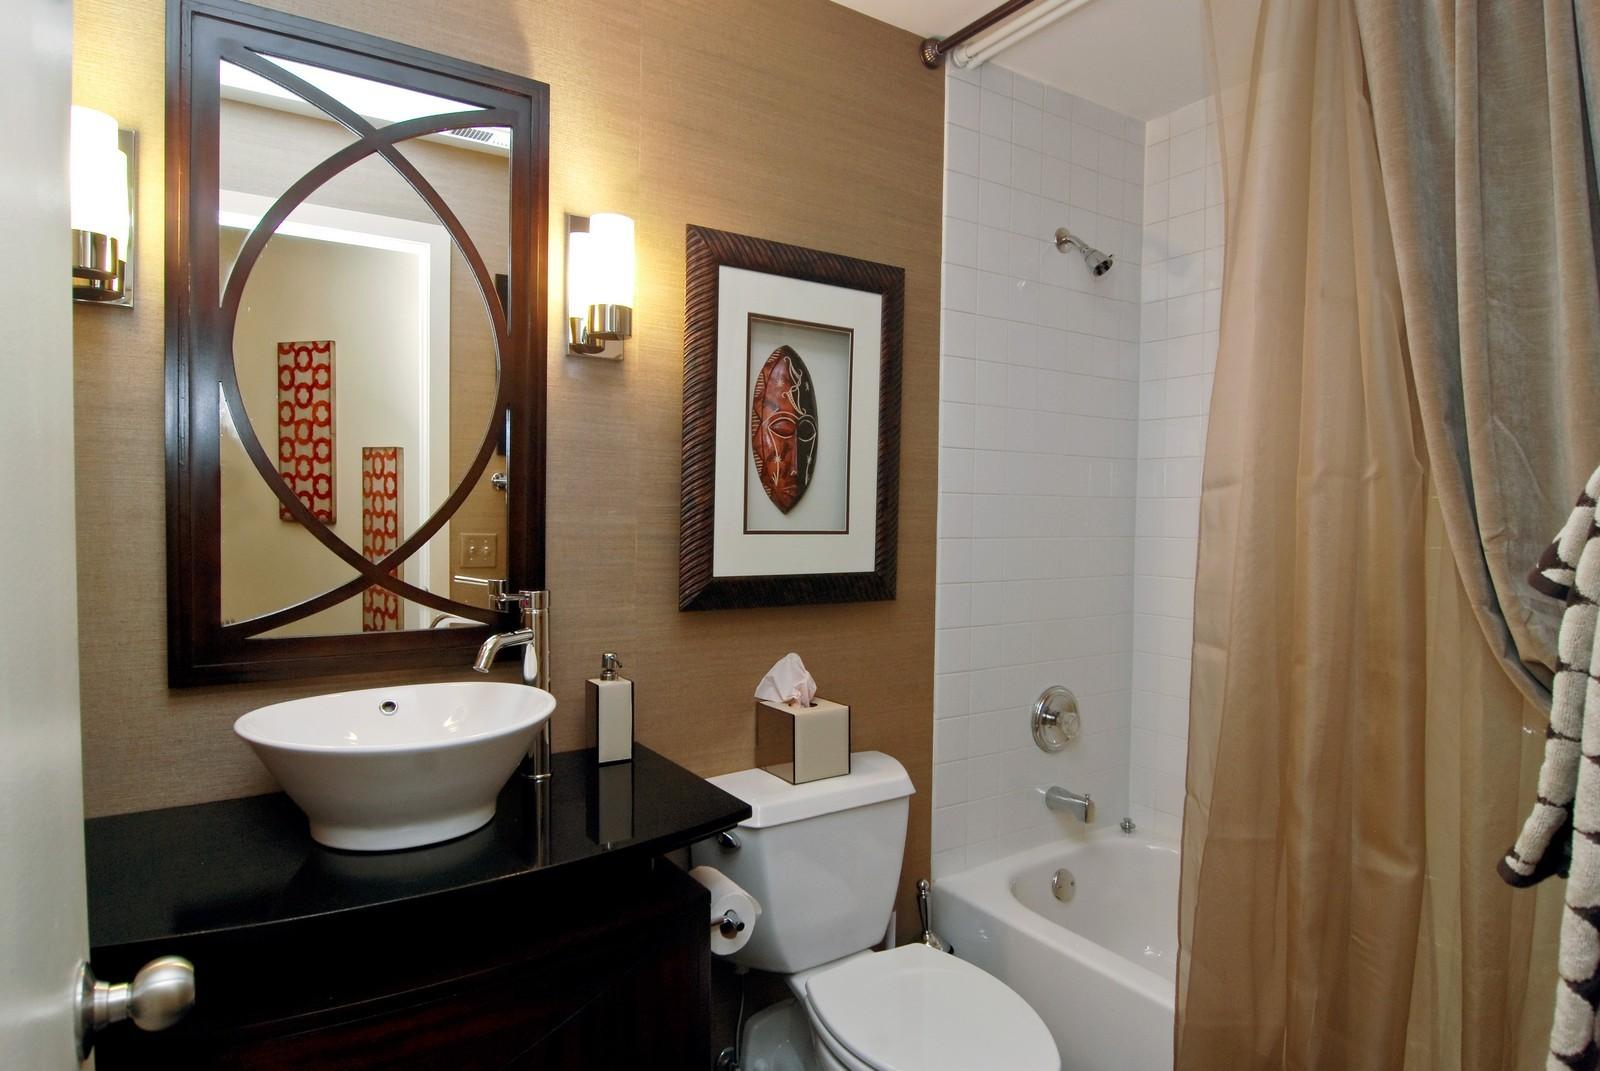 Real Estate Photography - 616 W Fulton, Unit 702, Chicago, IL, 60661 - Bathroom